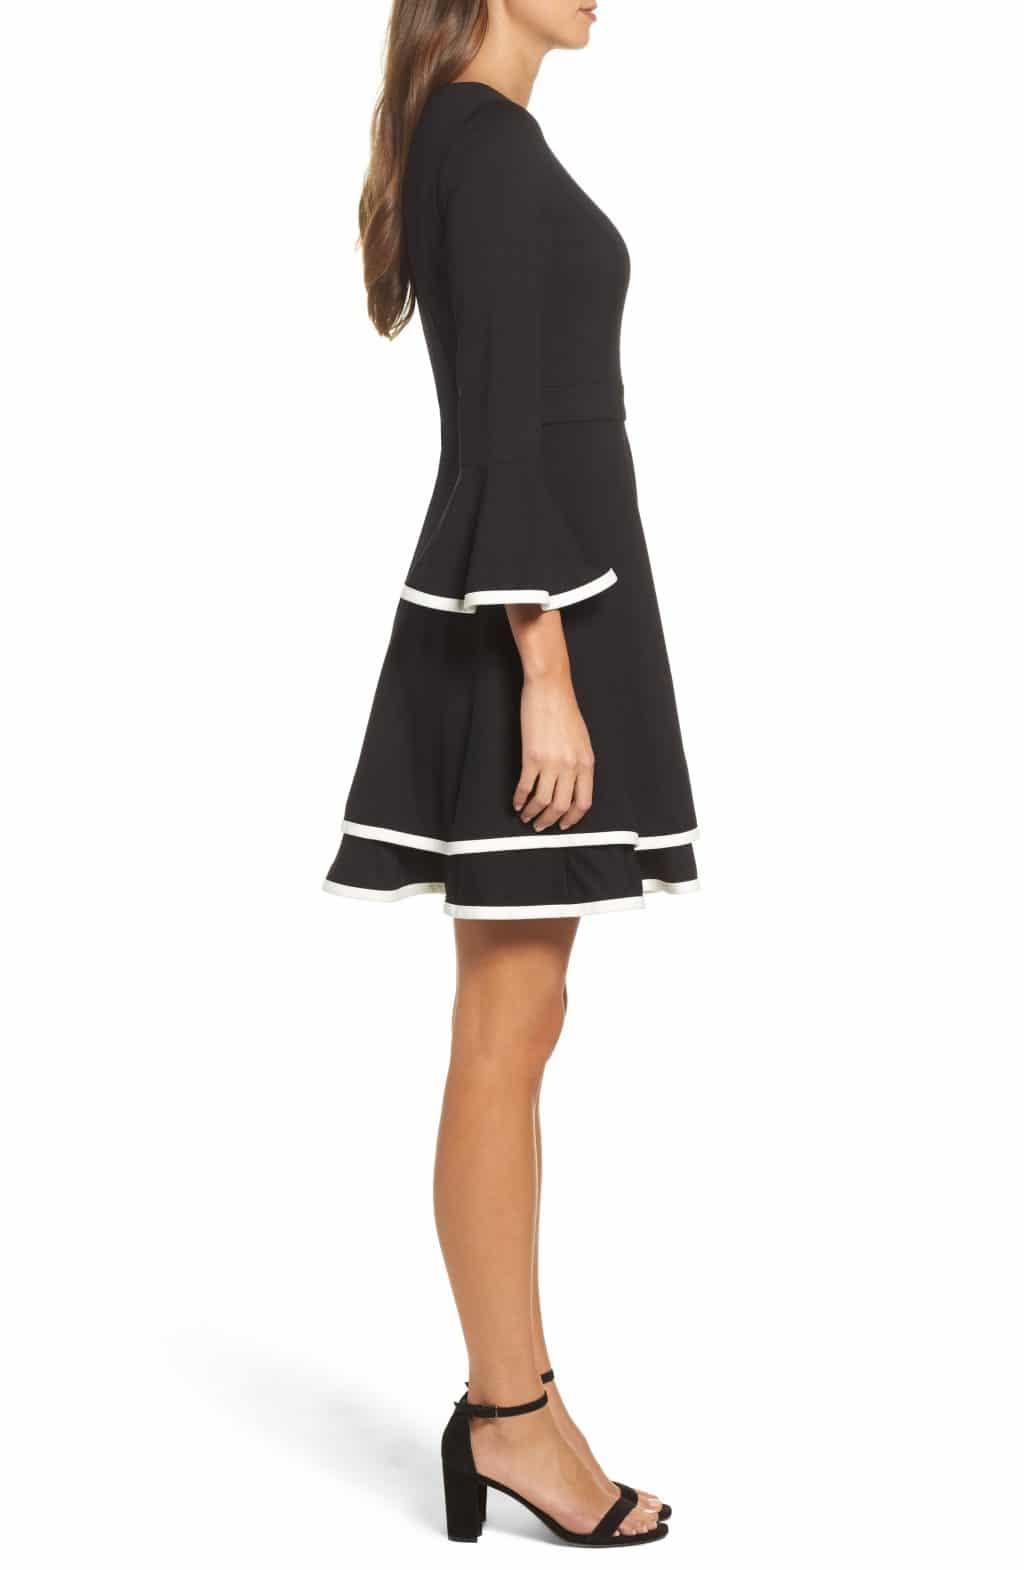 ELIZA J Bell Sleeve Fit Flare Black Ivory Dress 3 - beach wedding guest dresses casual